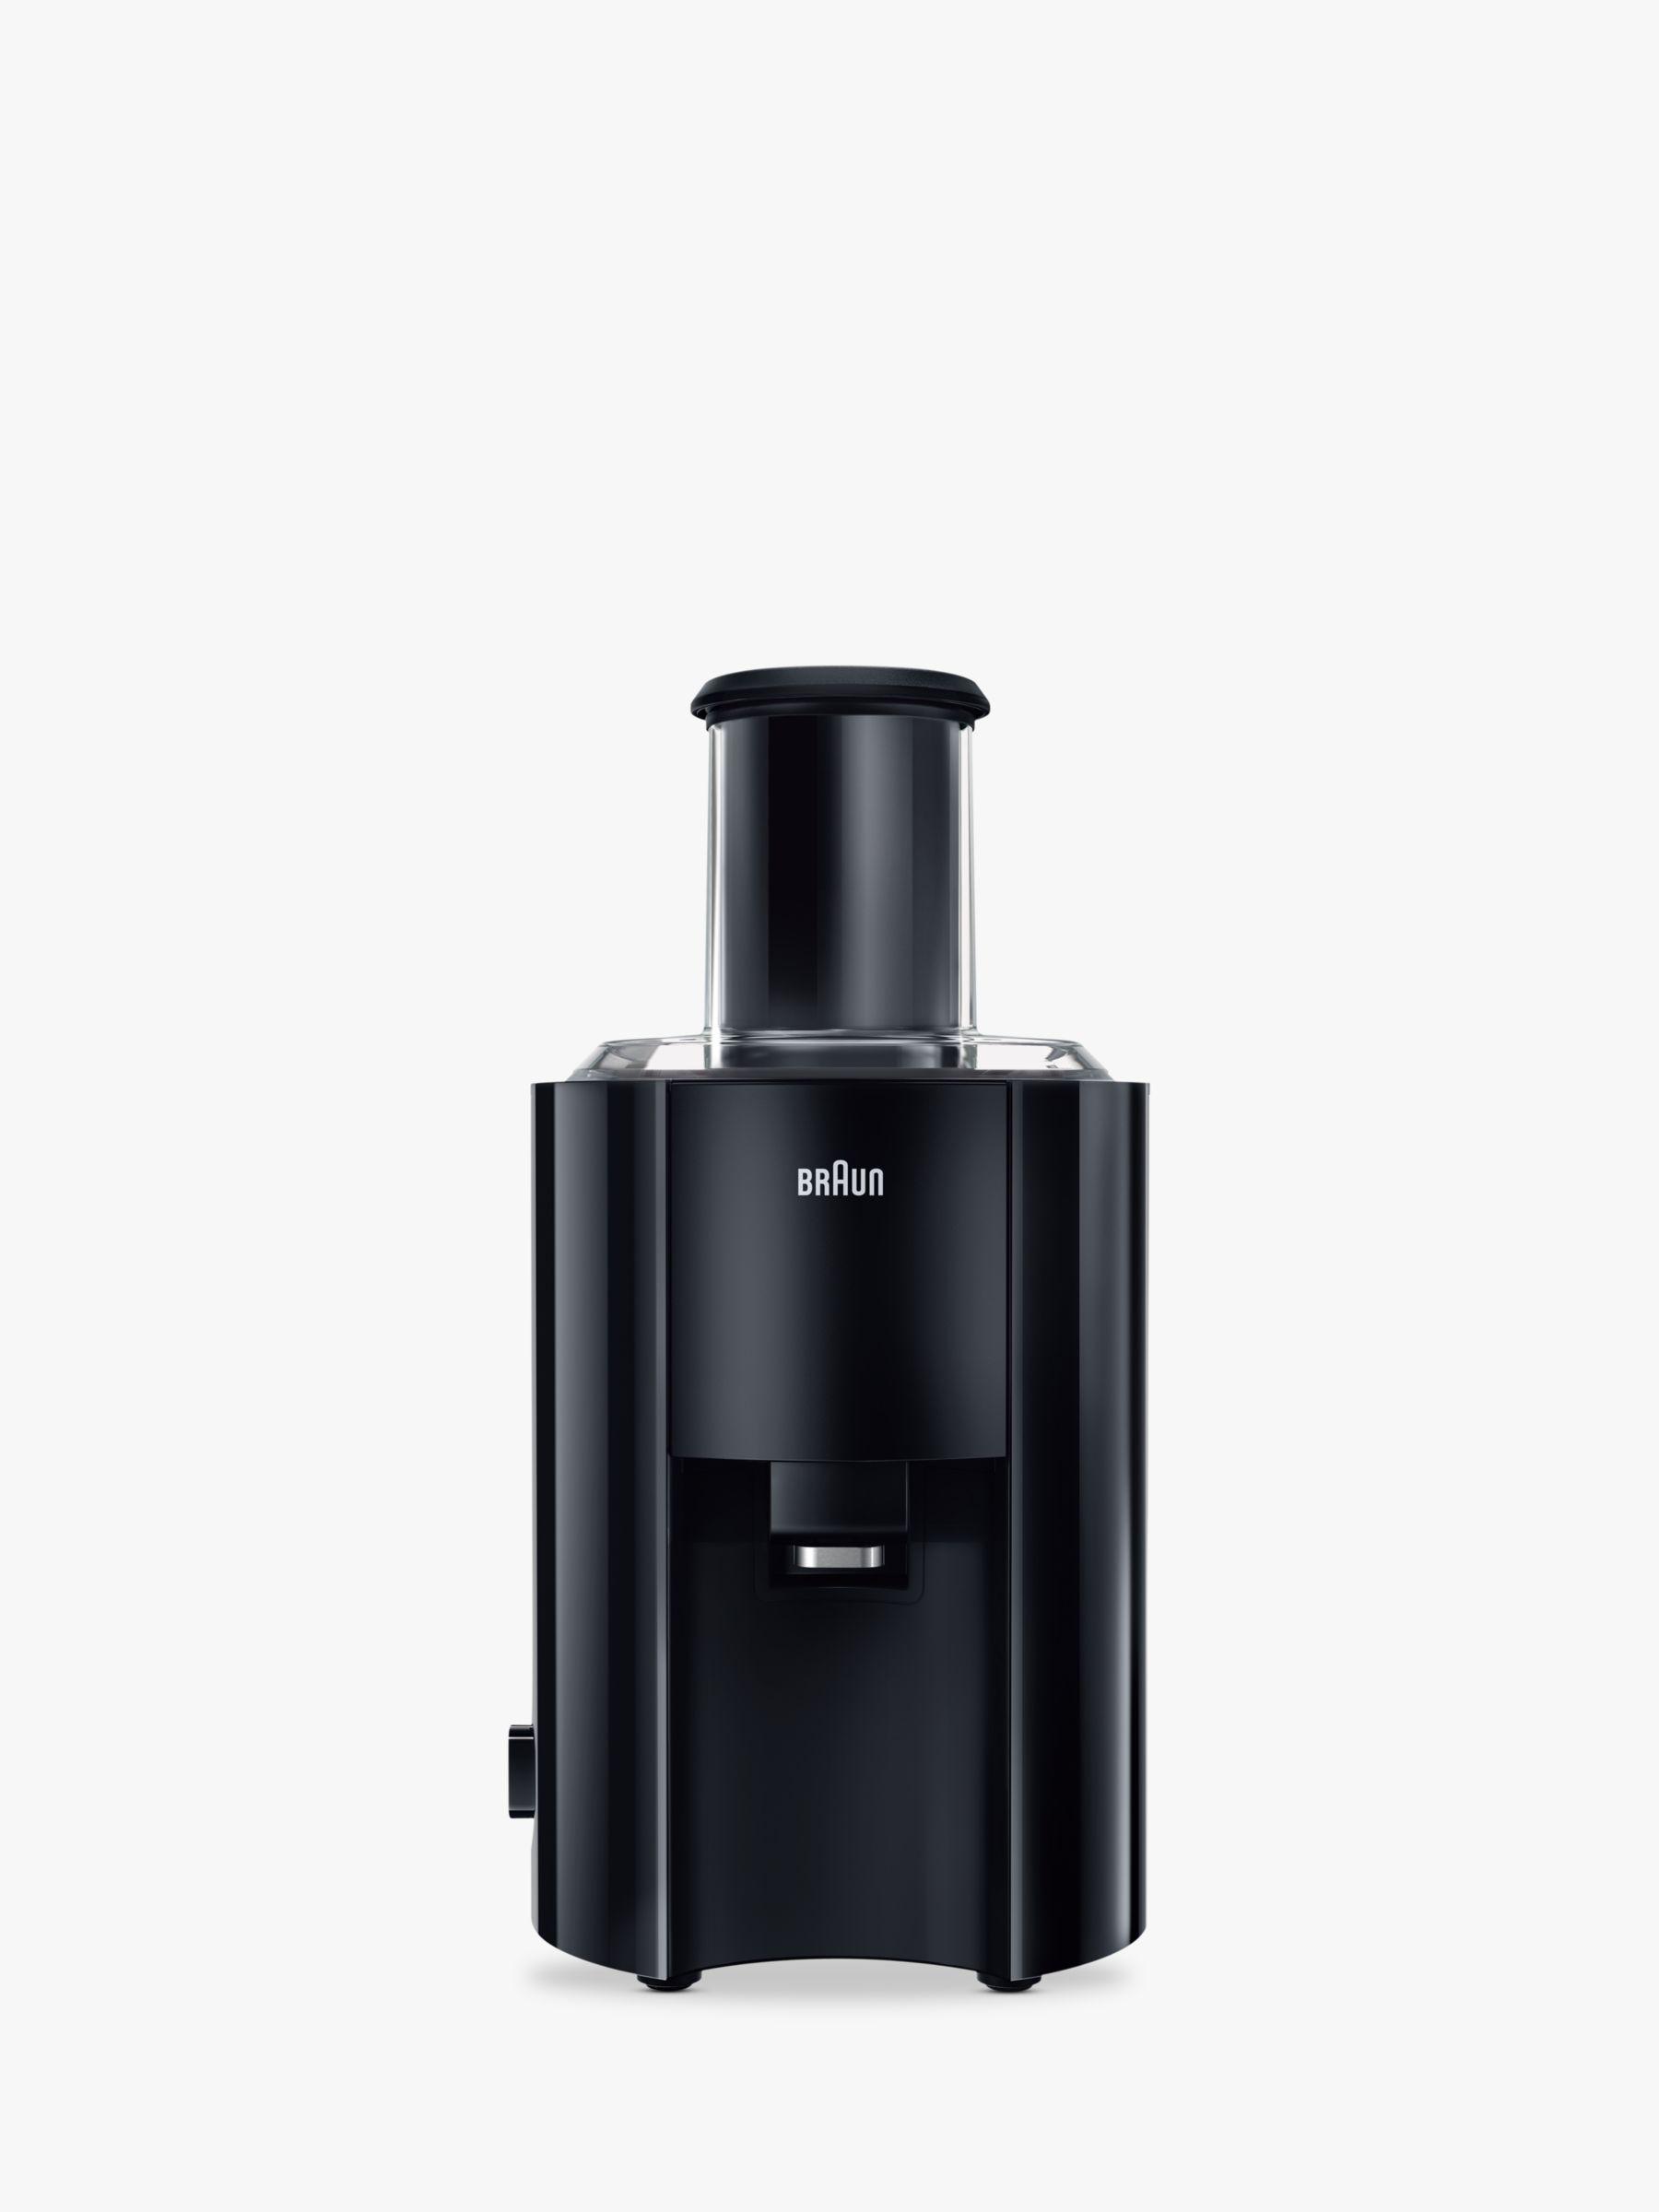 Braun Braun J300 Juicer, Black